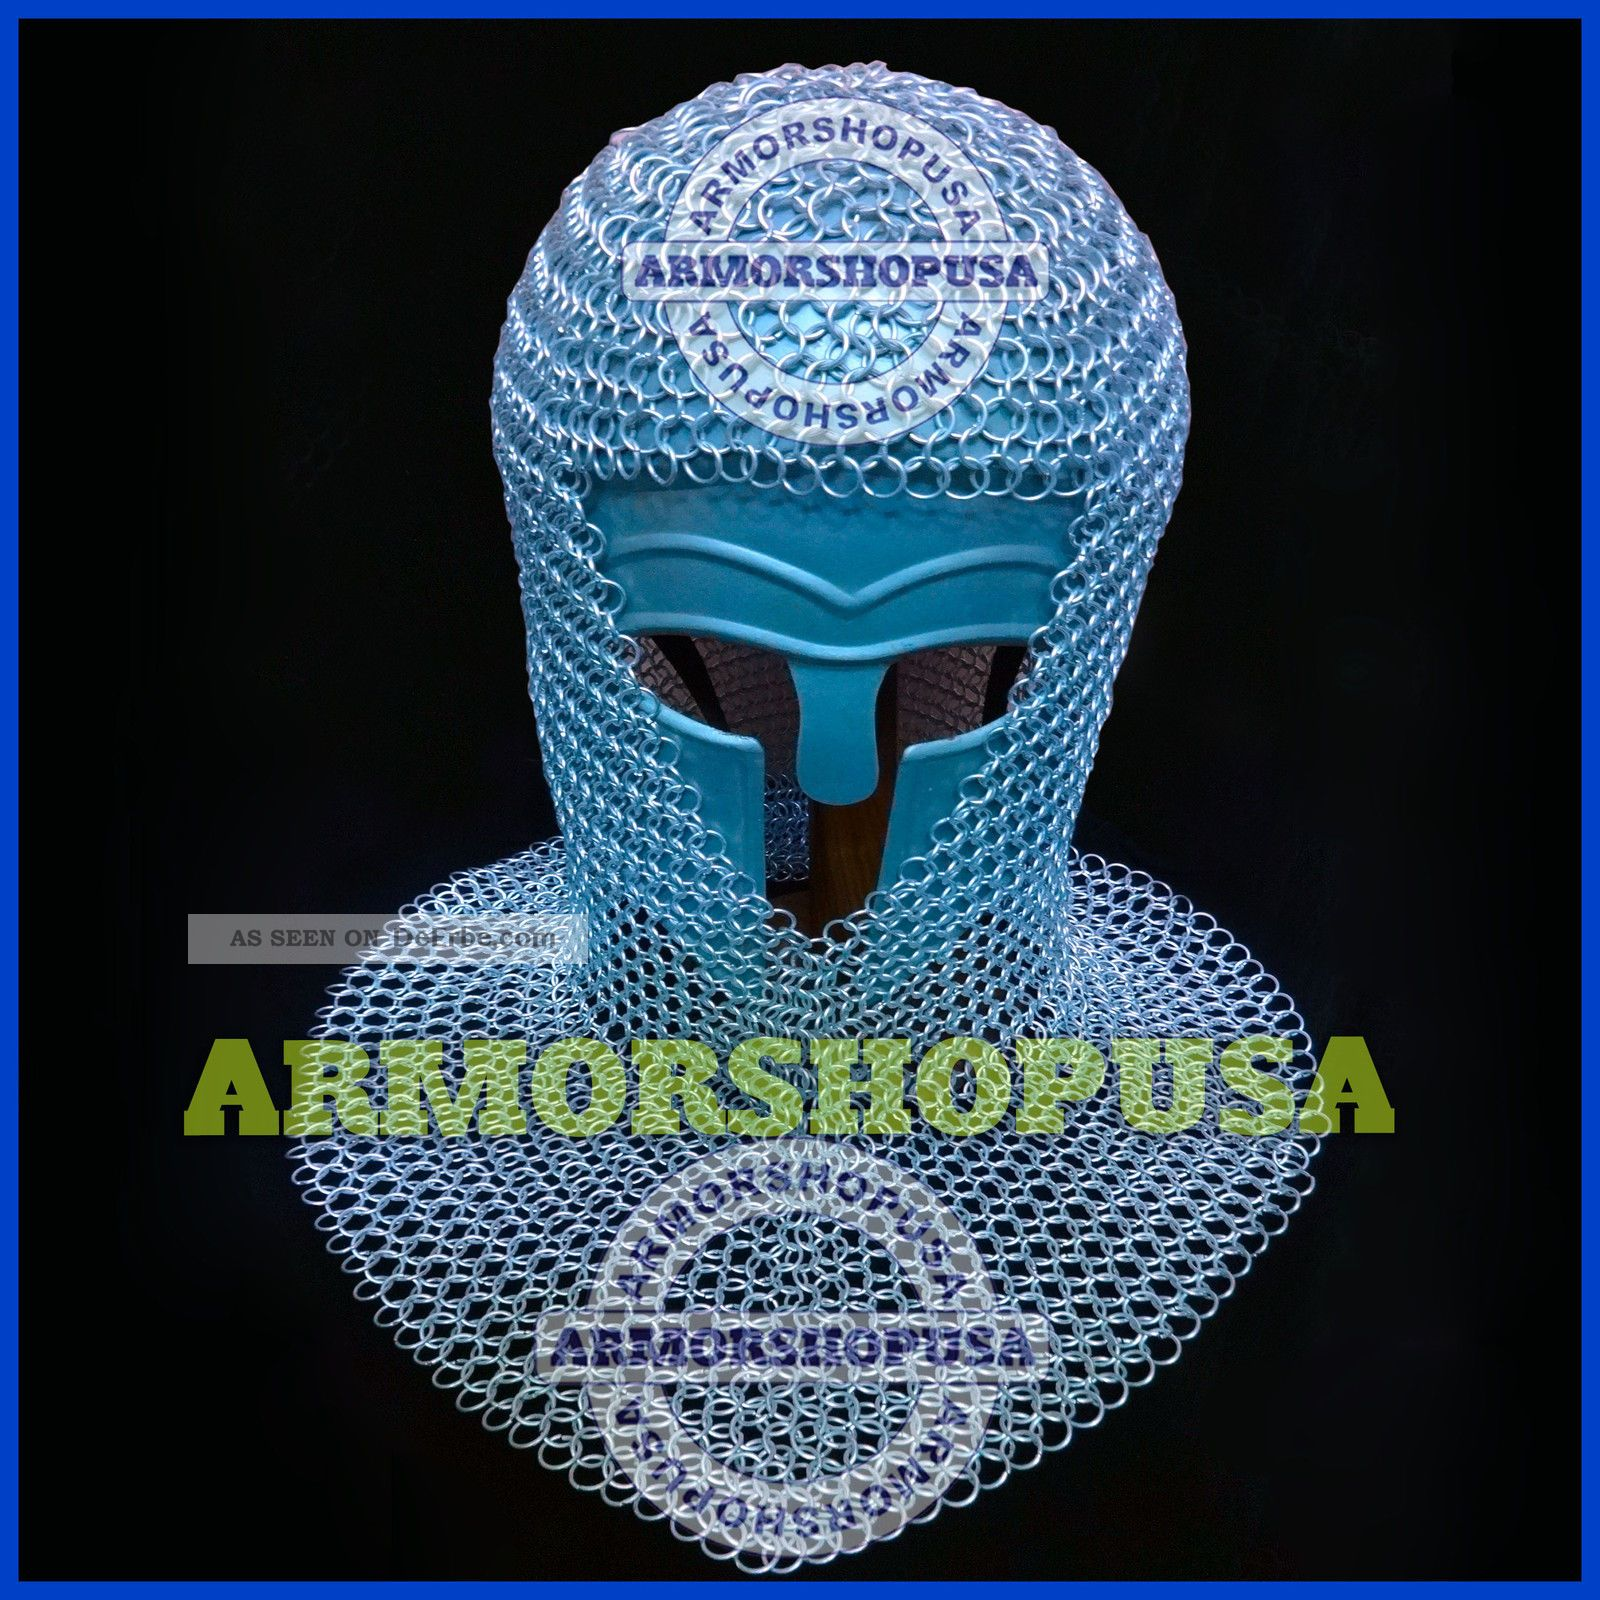 Kopfhaube Kettenhemd Aus Aluminium Kettenhaube Mittelalter Rüstung Kostüm Coif Antike Bild